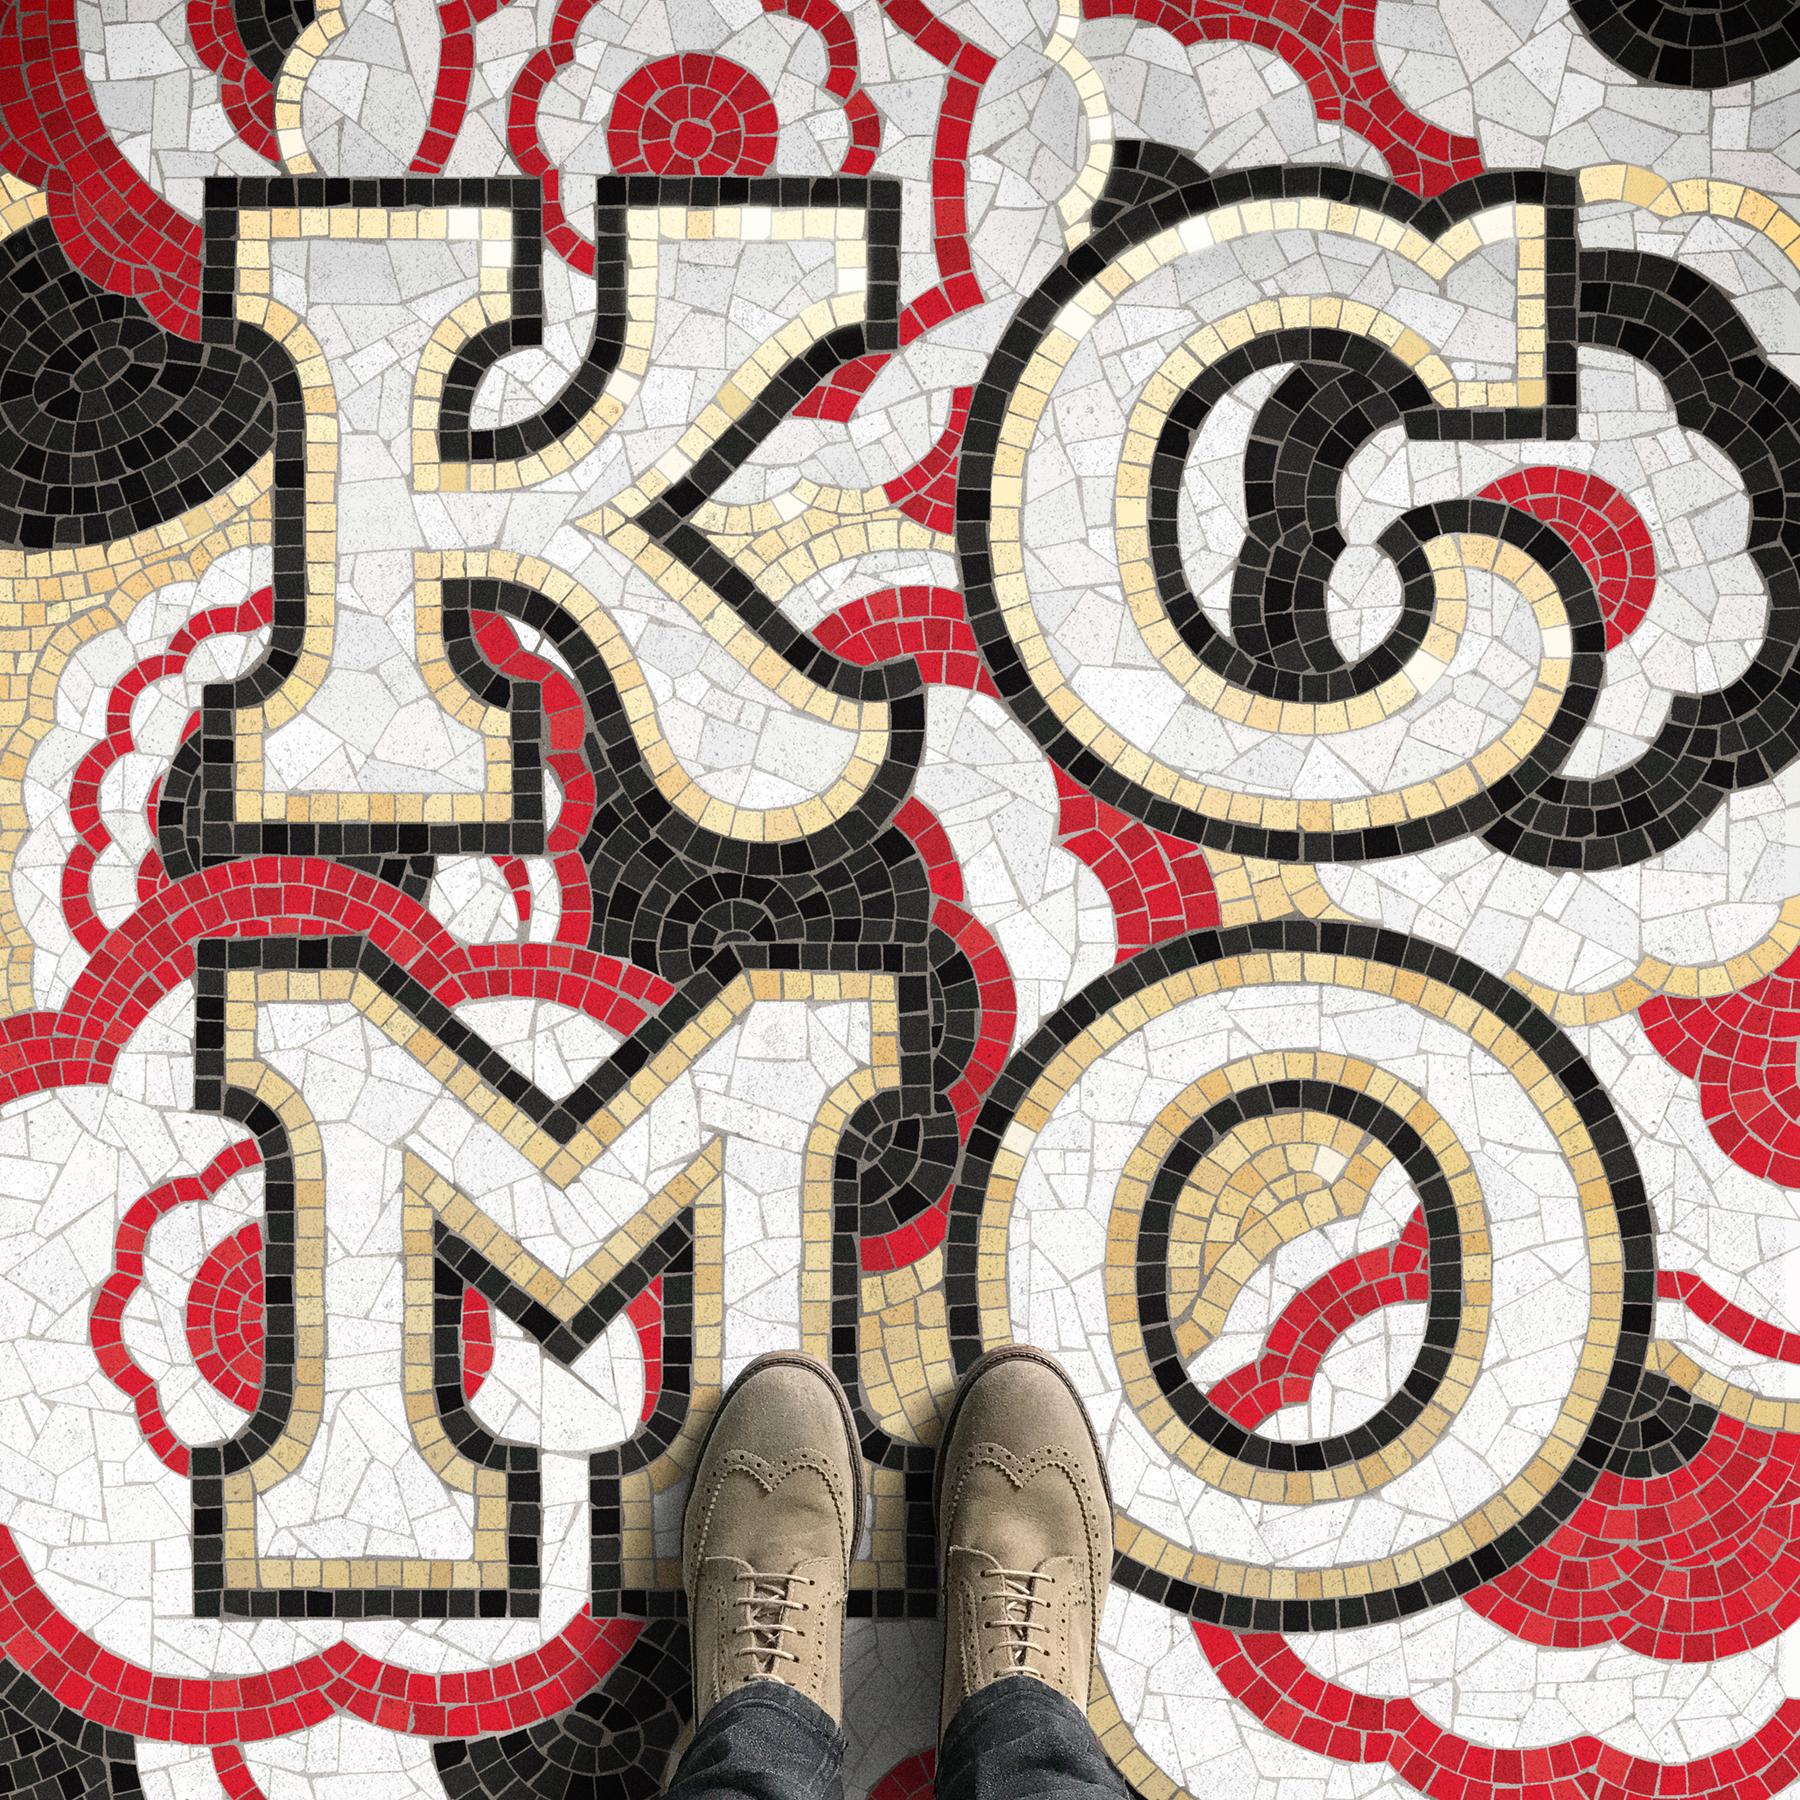 KCMO_square.jpg